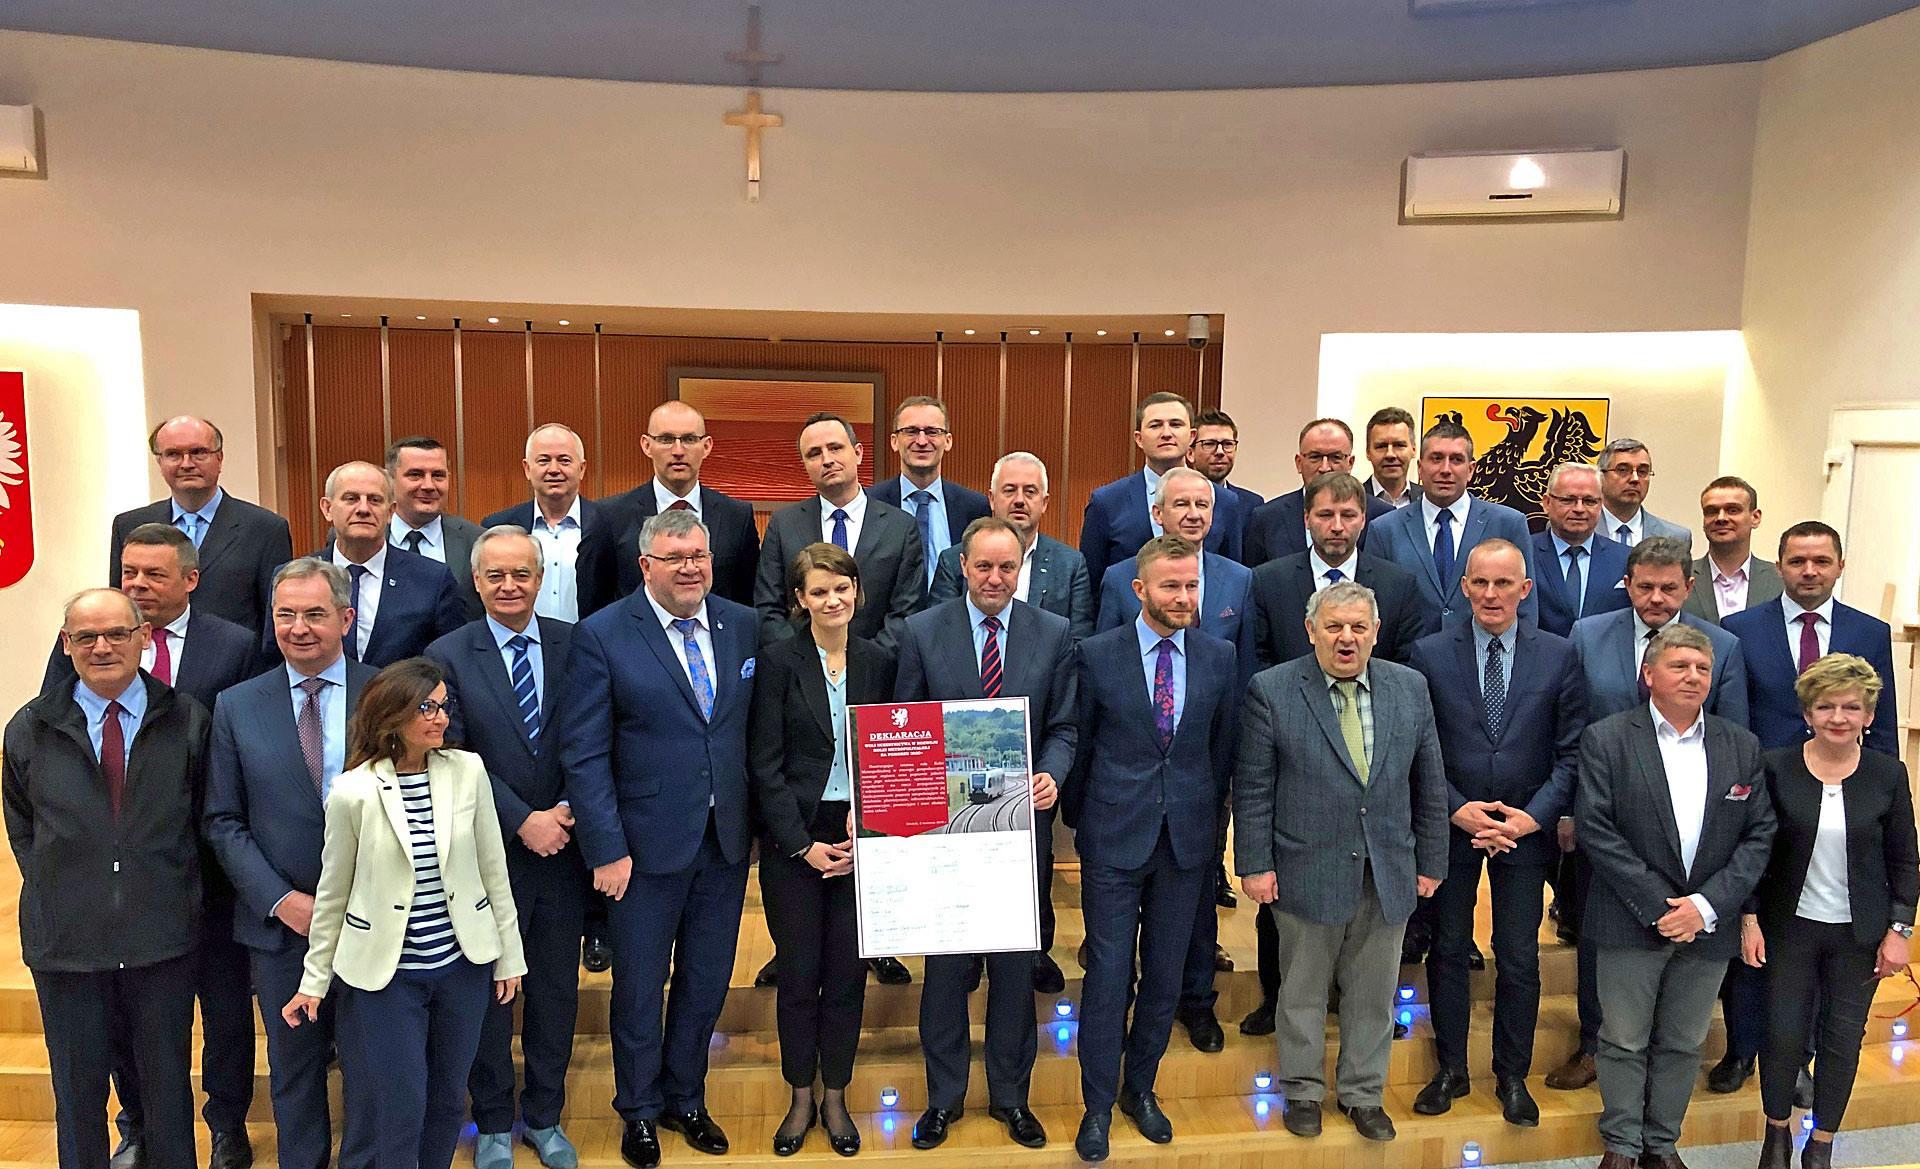 Sygnatariusze deklaracji / fot. Aleksander Olszak